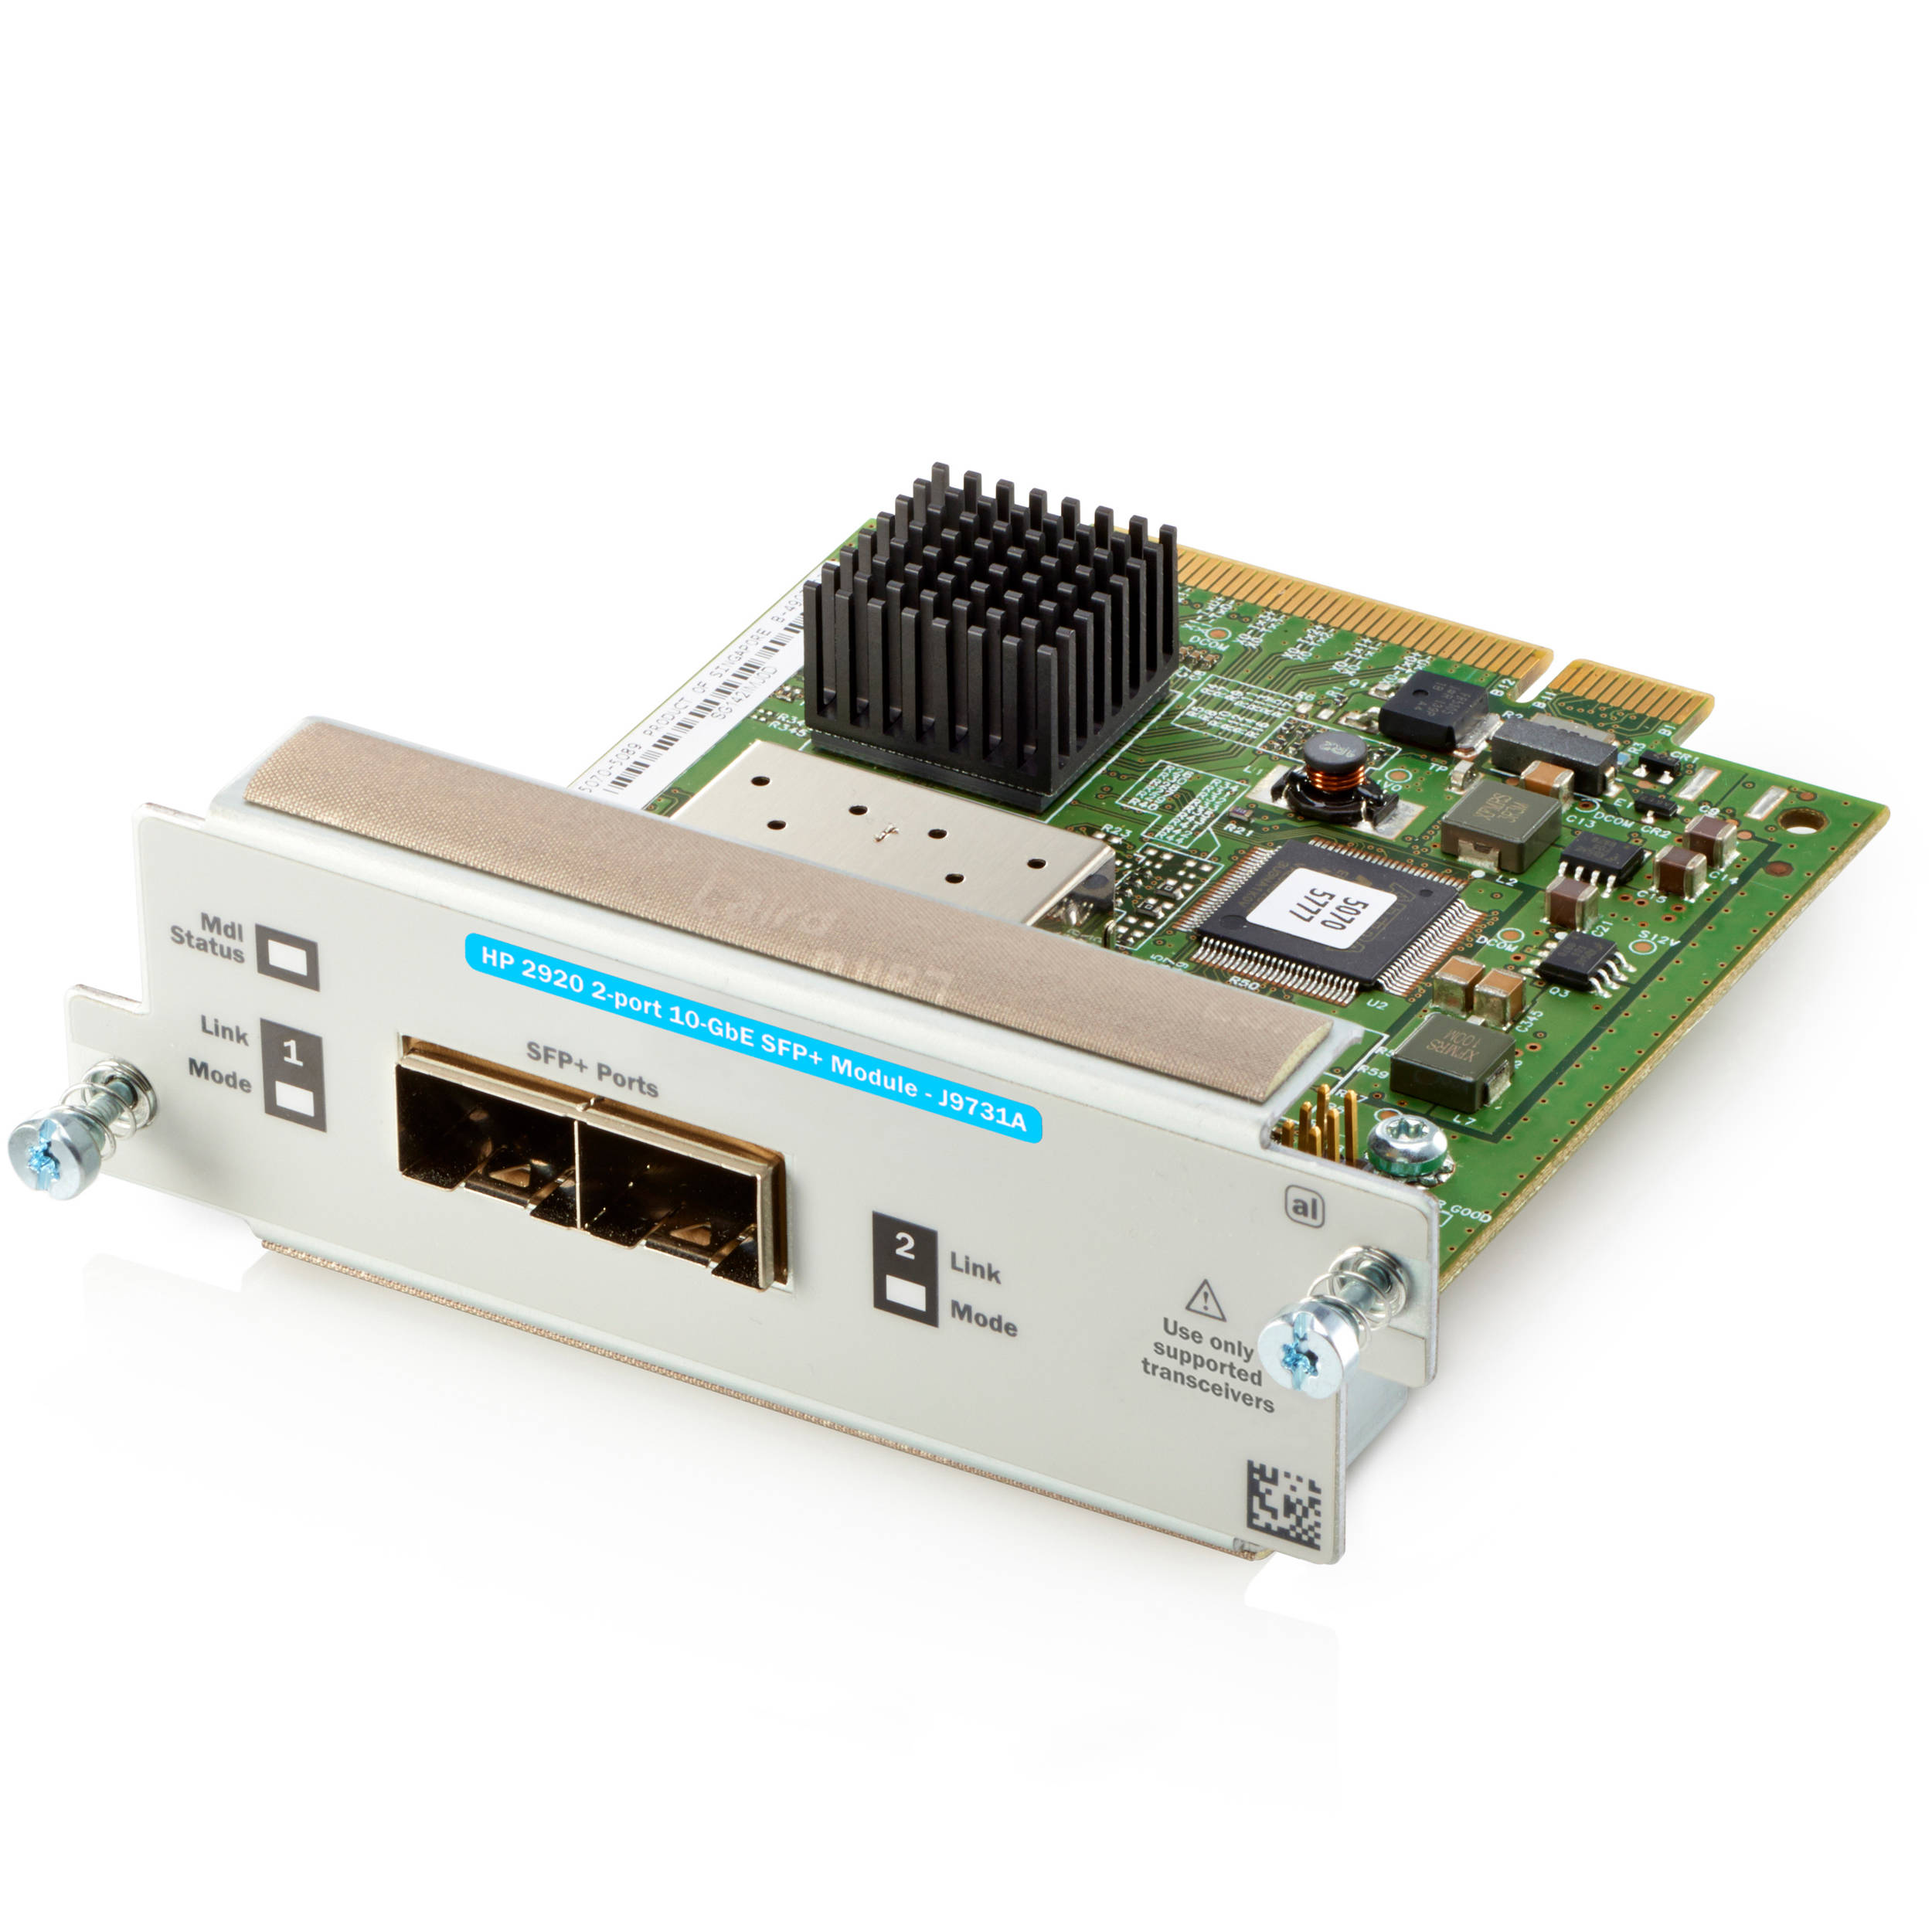 Hp J9731a 2 Port 10gbe Sfp Module For Hp 2920 Switch